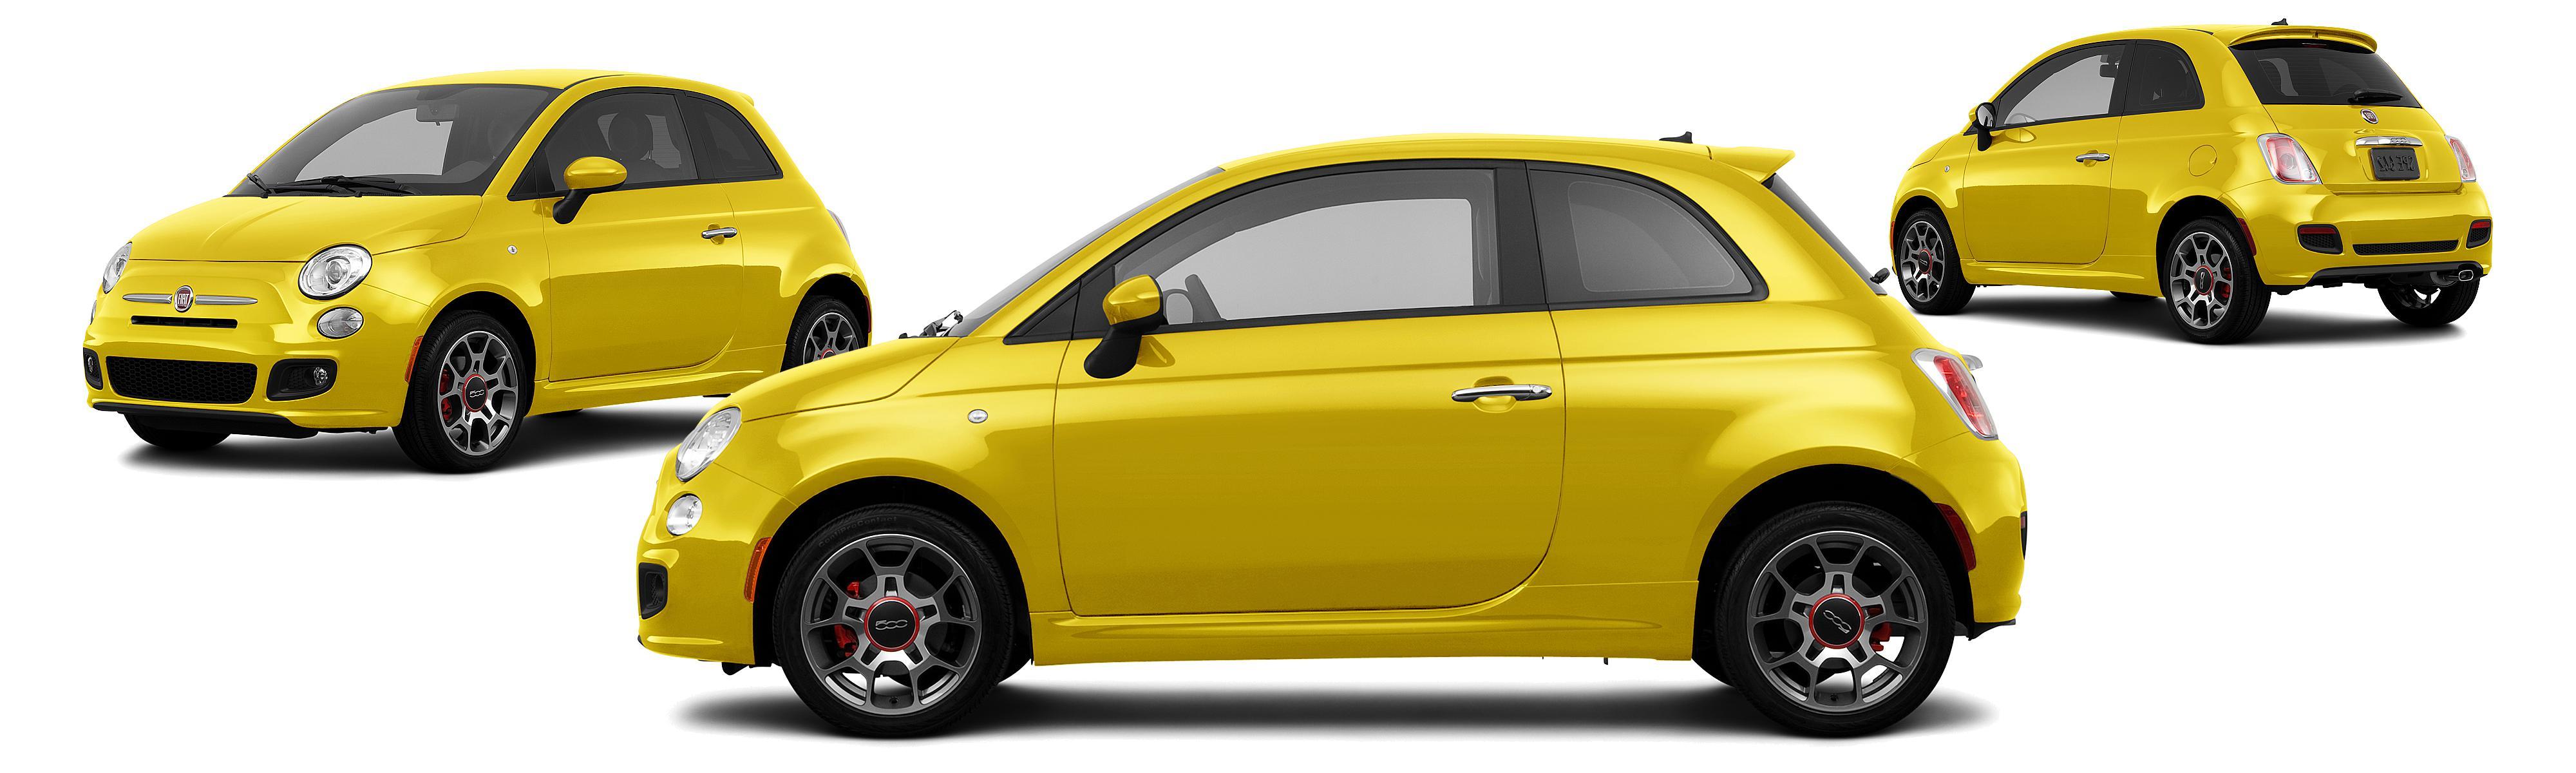 2013 fiat 500 sport 2dr hatchback research groovecar rh groovecar com